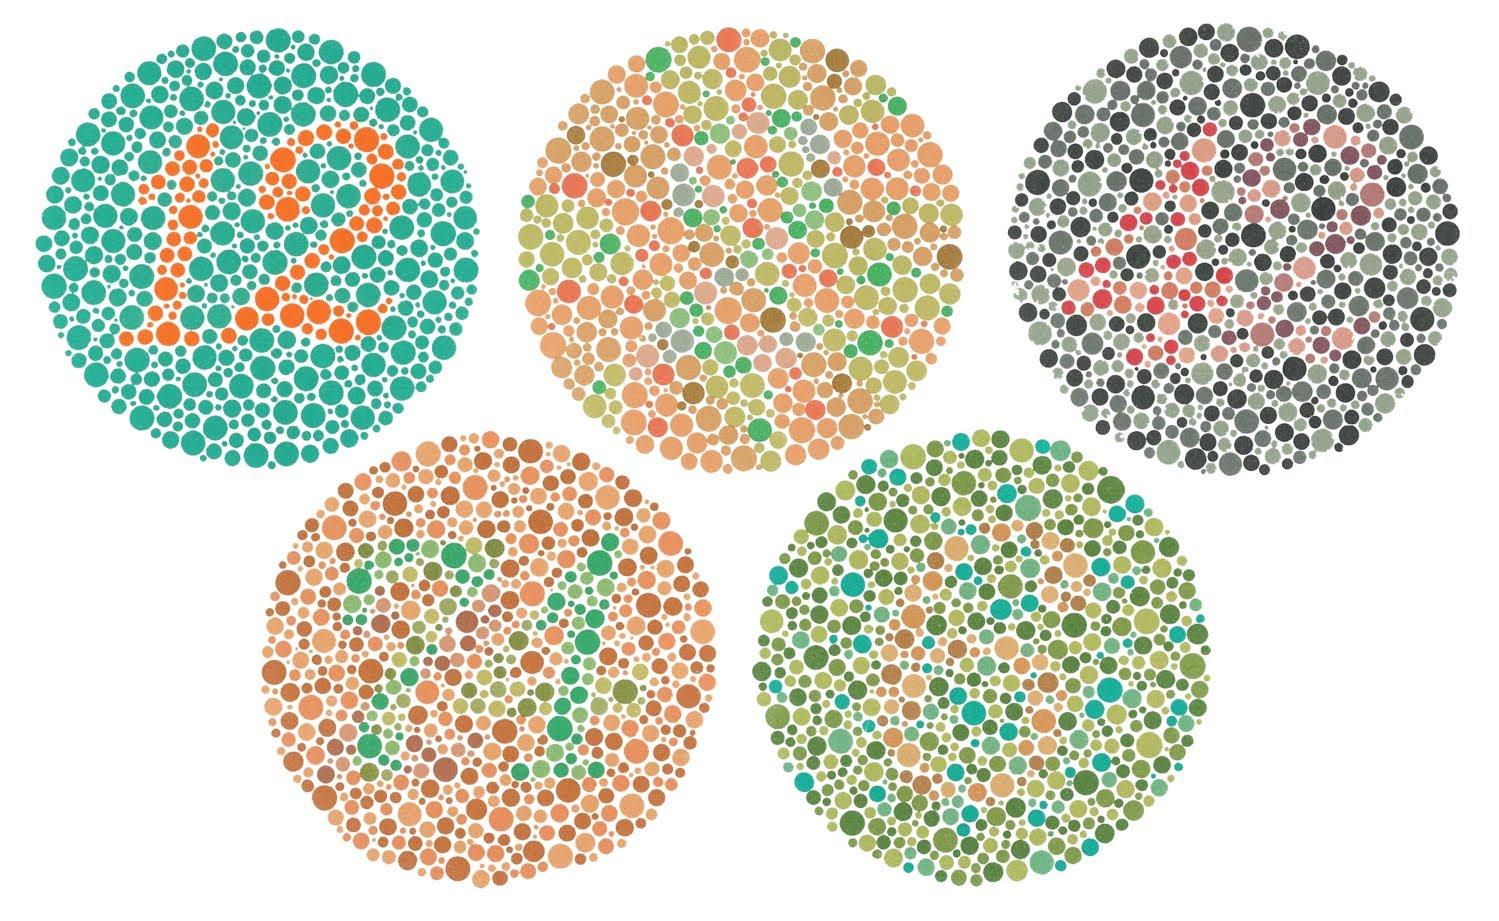 Renk Körlüğü özel Veni Vidi Göz Sağlığı Merkezi